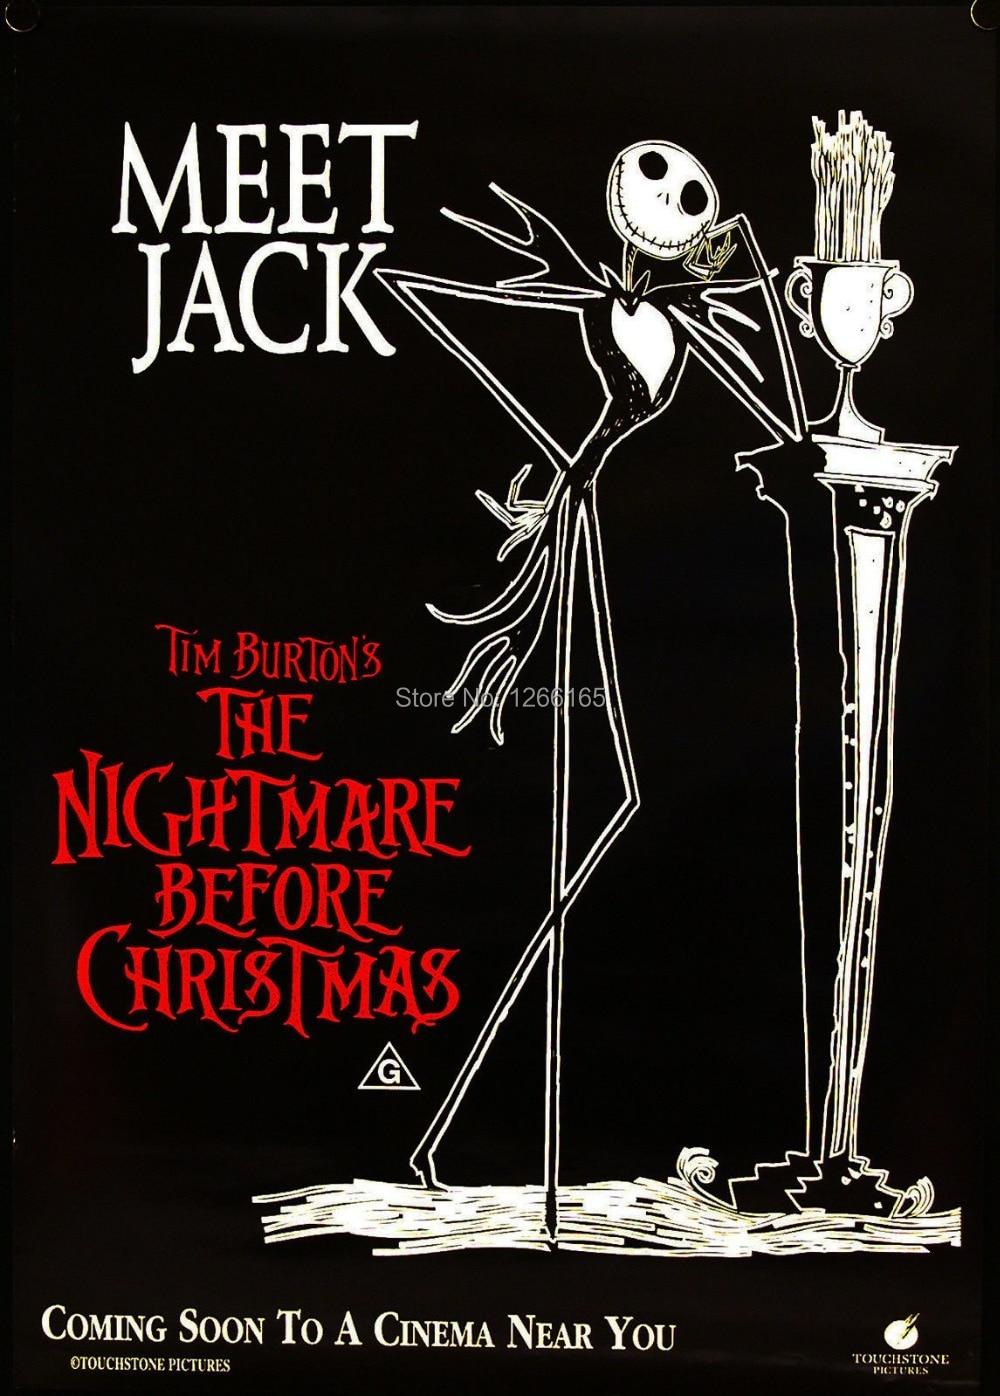 the nightmare before christmas movie poster jack tim burton print on silk home decoration 12x18. Black Bedroom Furniture Sets. Home Design Ideas